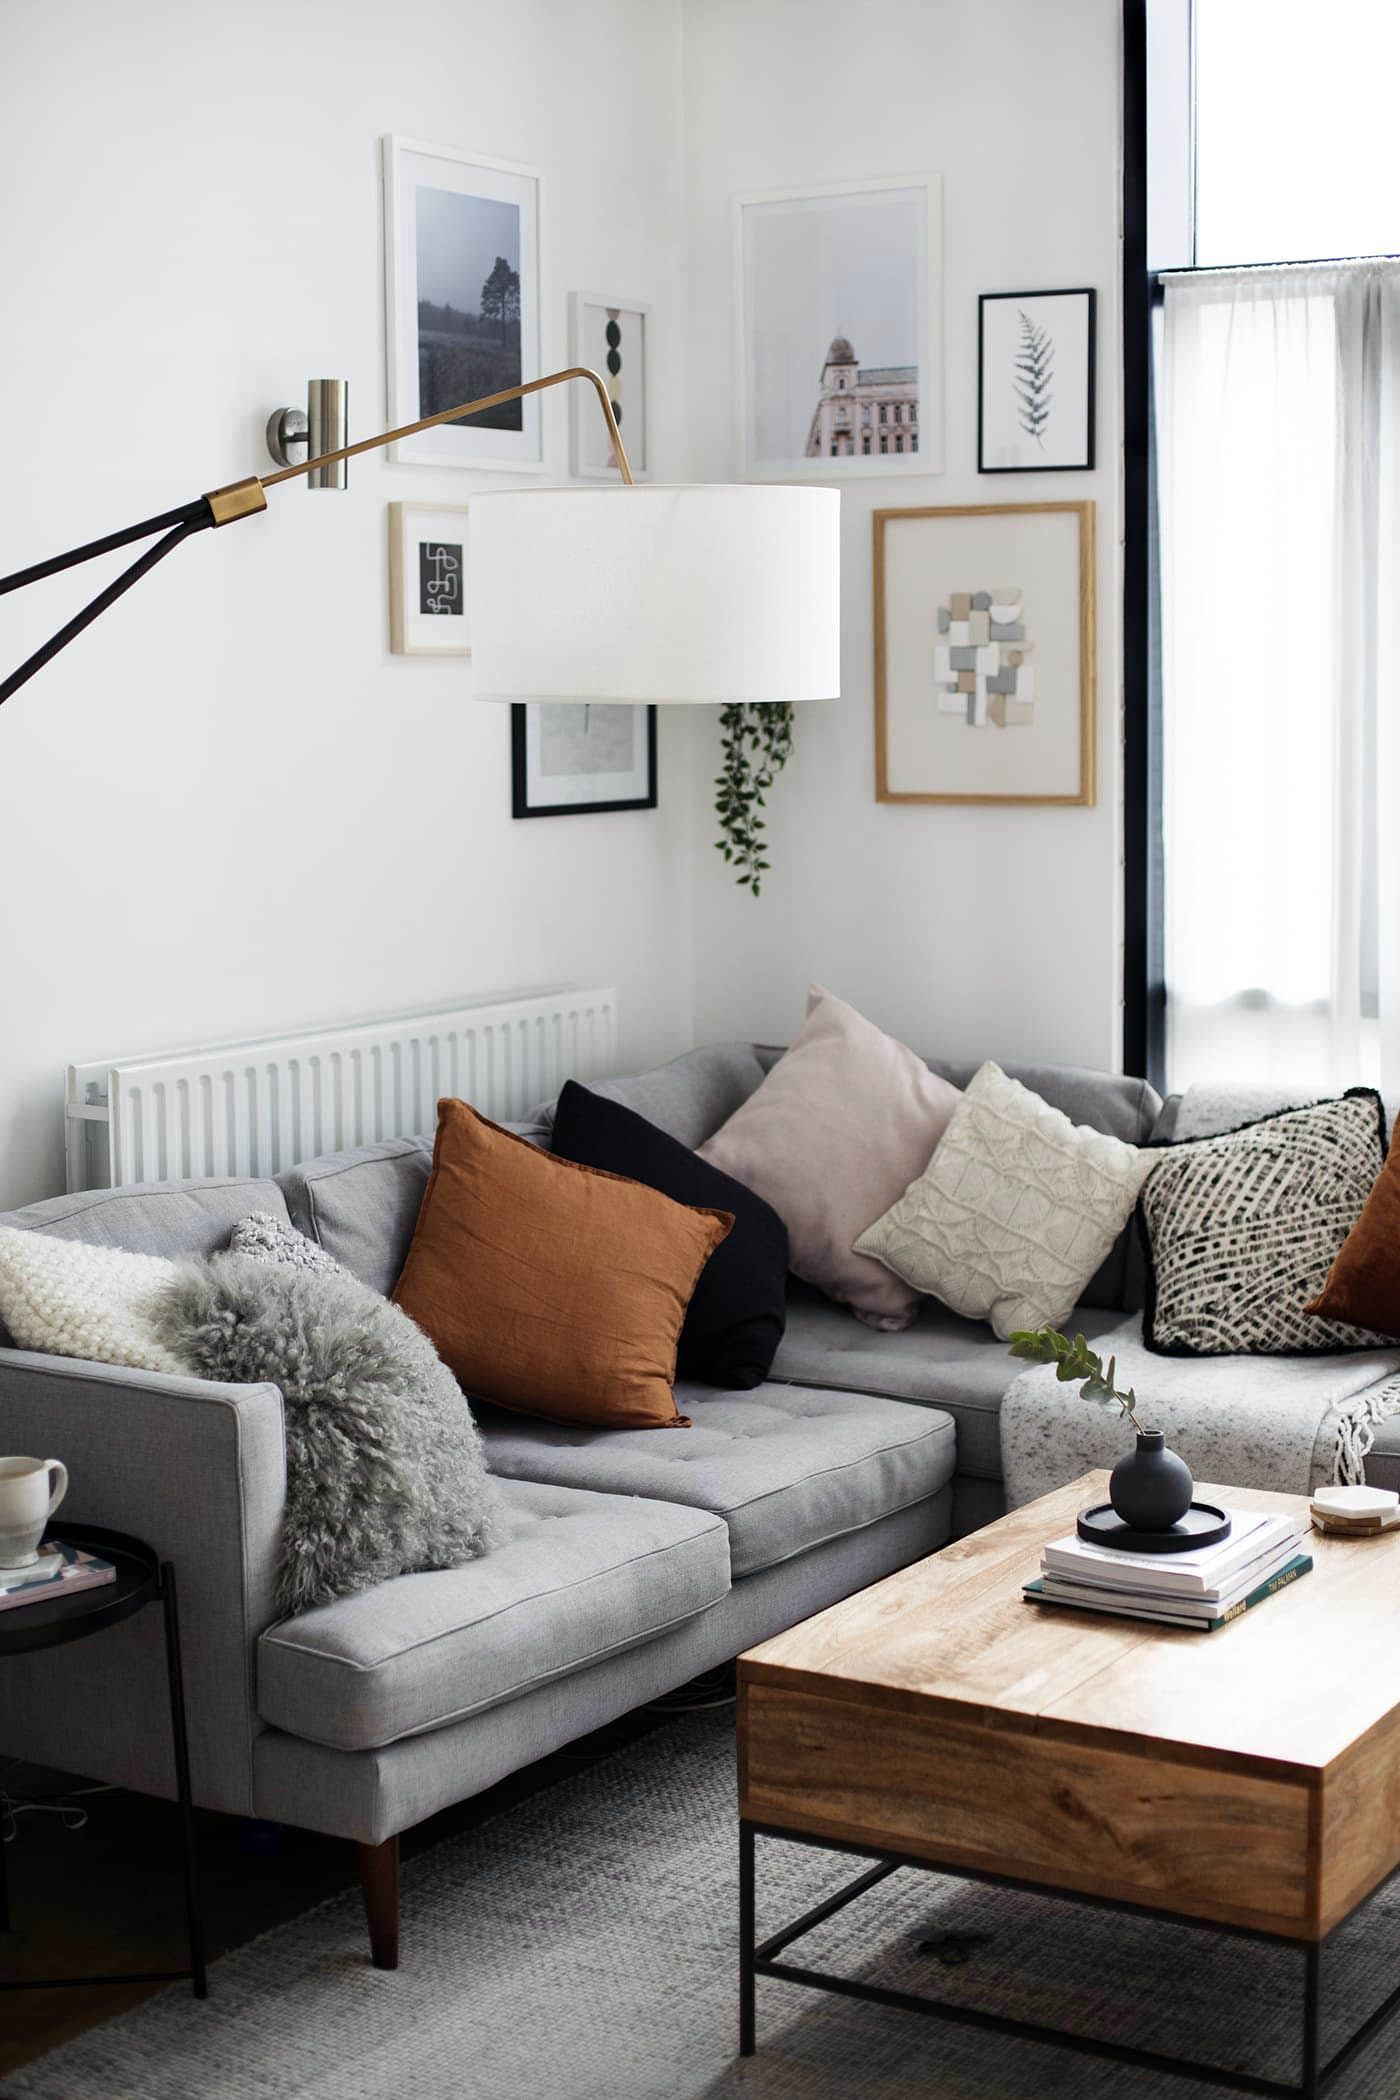 Get These Top Trending Living Room Lighting Houzz To Inspire